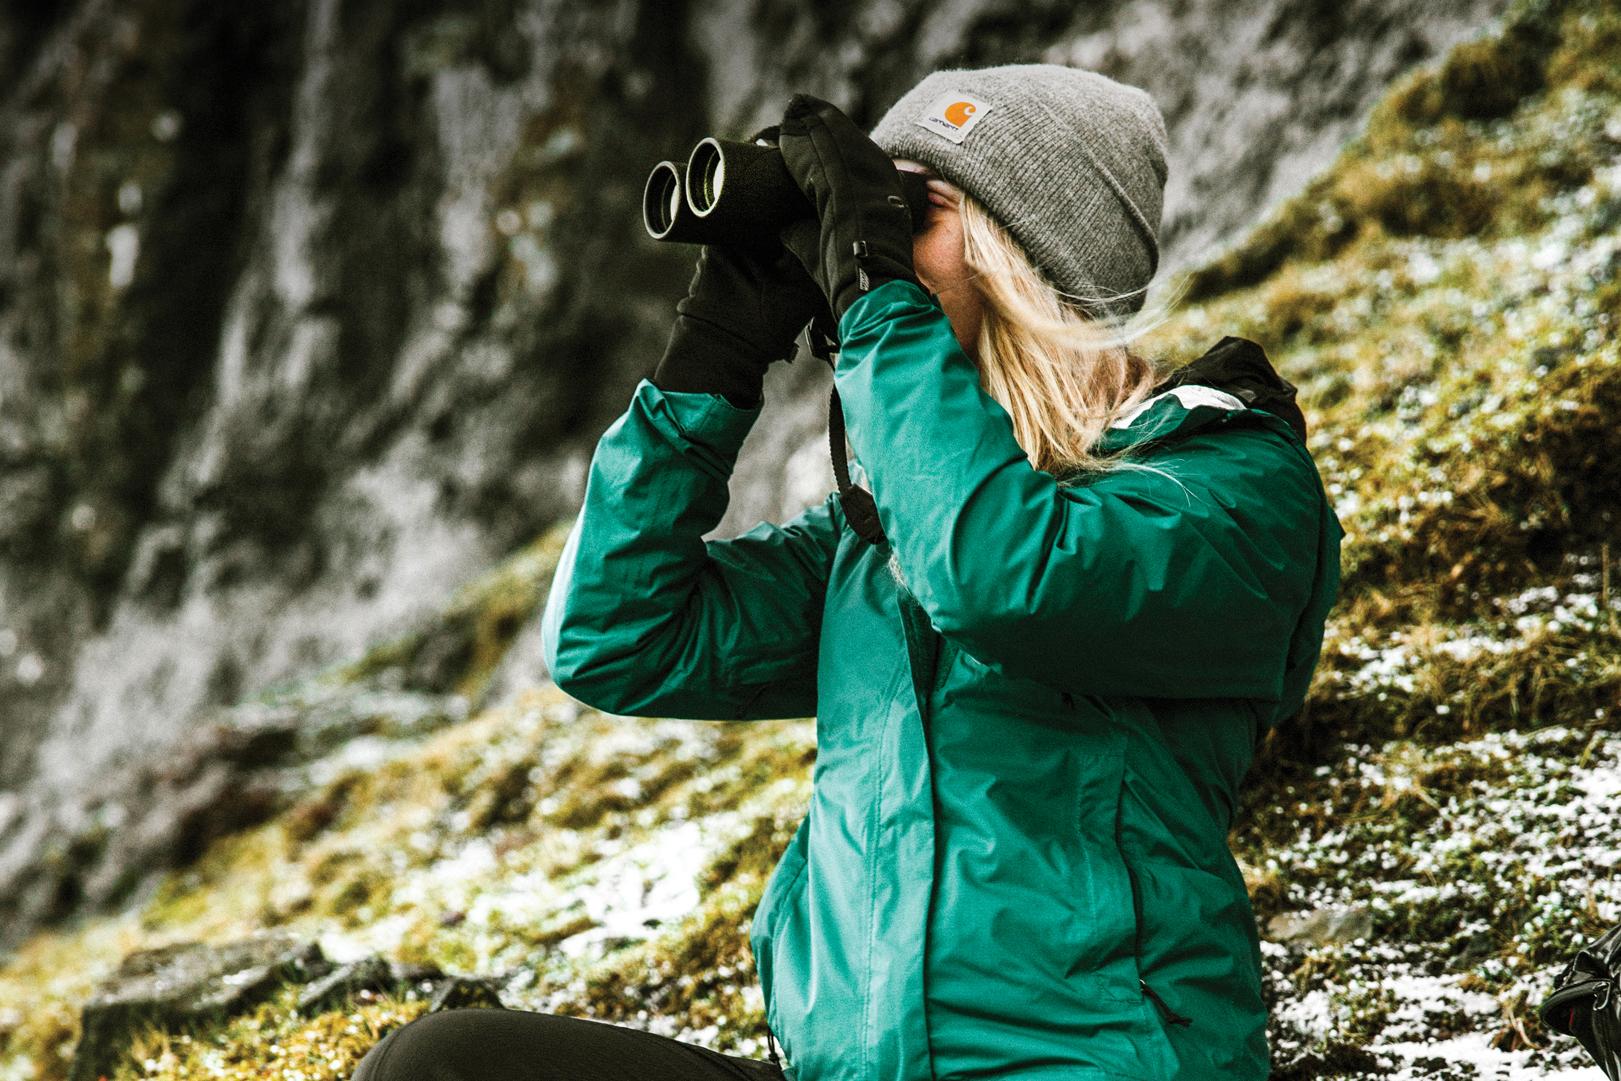 Free Gear Fridays: Nikon PROSTAFF 7S 10×42 Binoculars